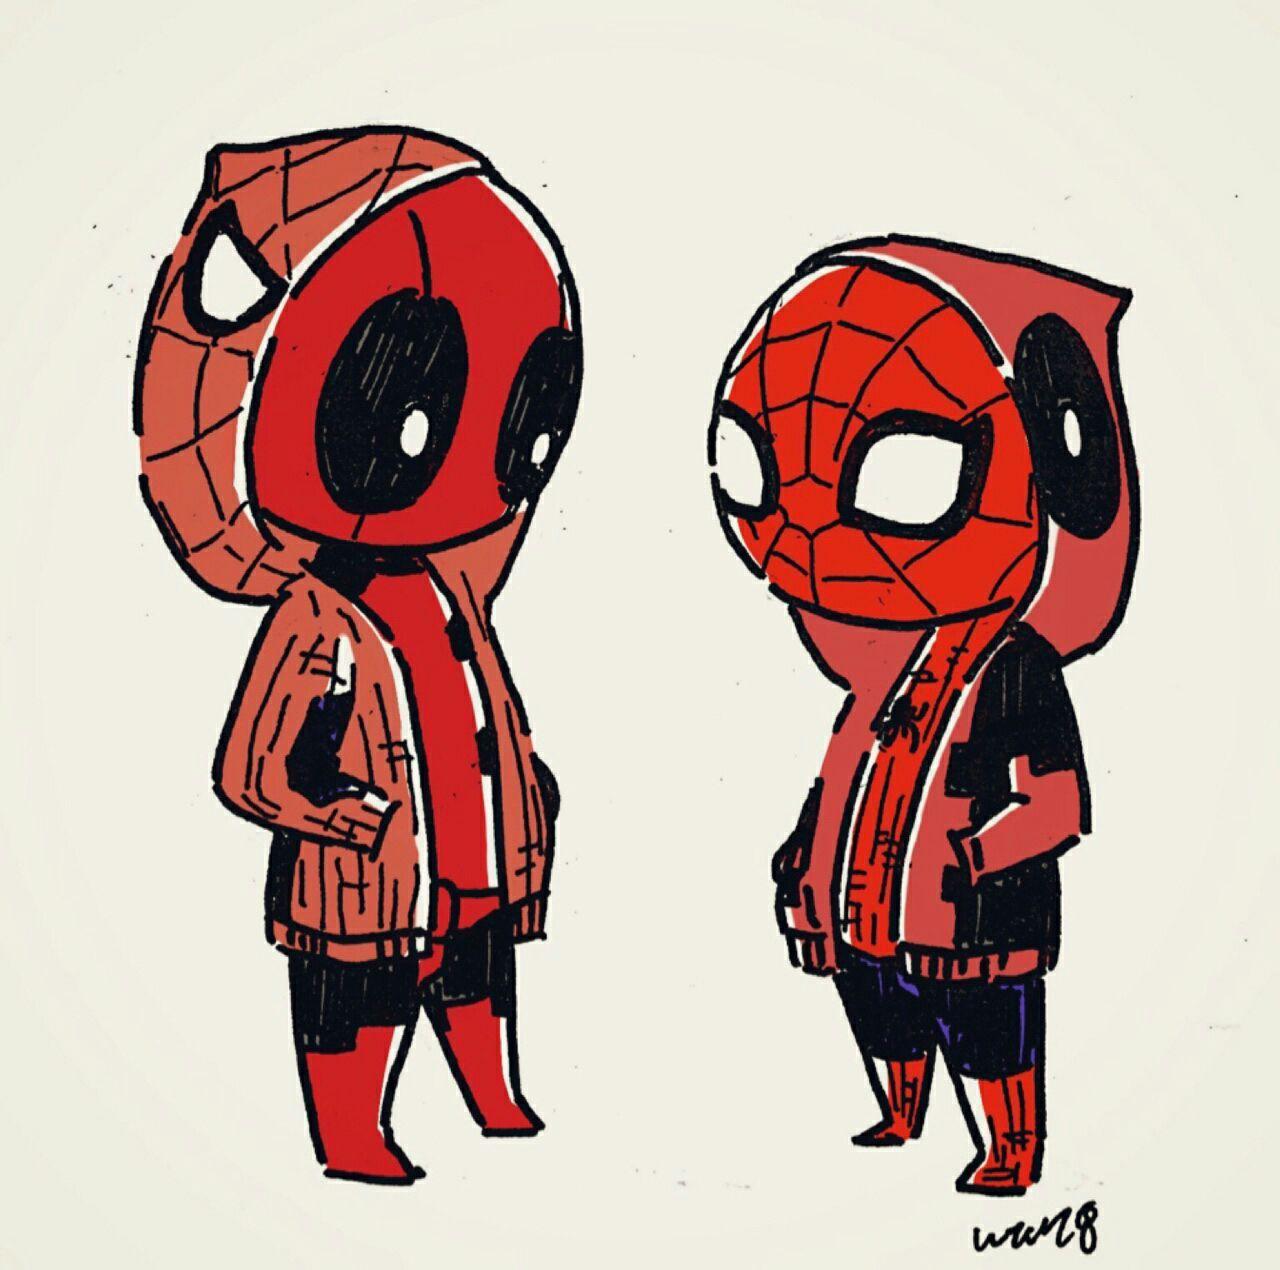 Deadpool Y El Hombre Araña Deadpool Deadpool X Spiderman